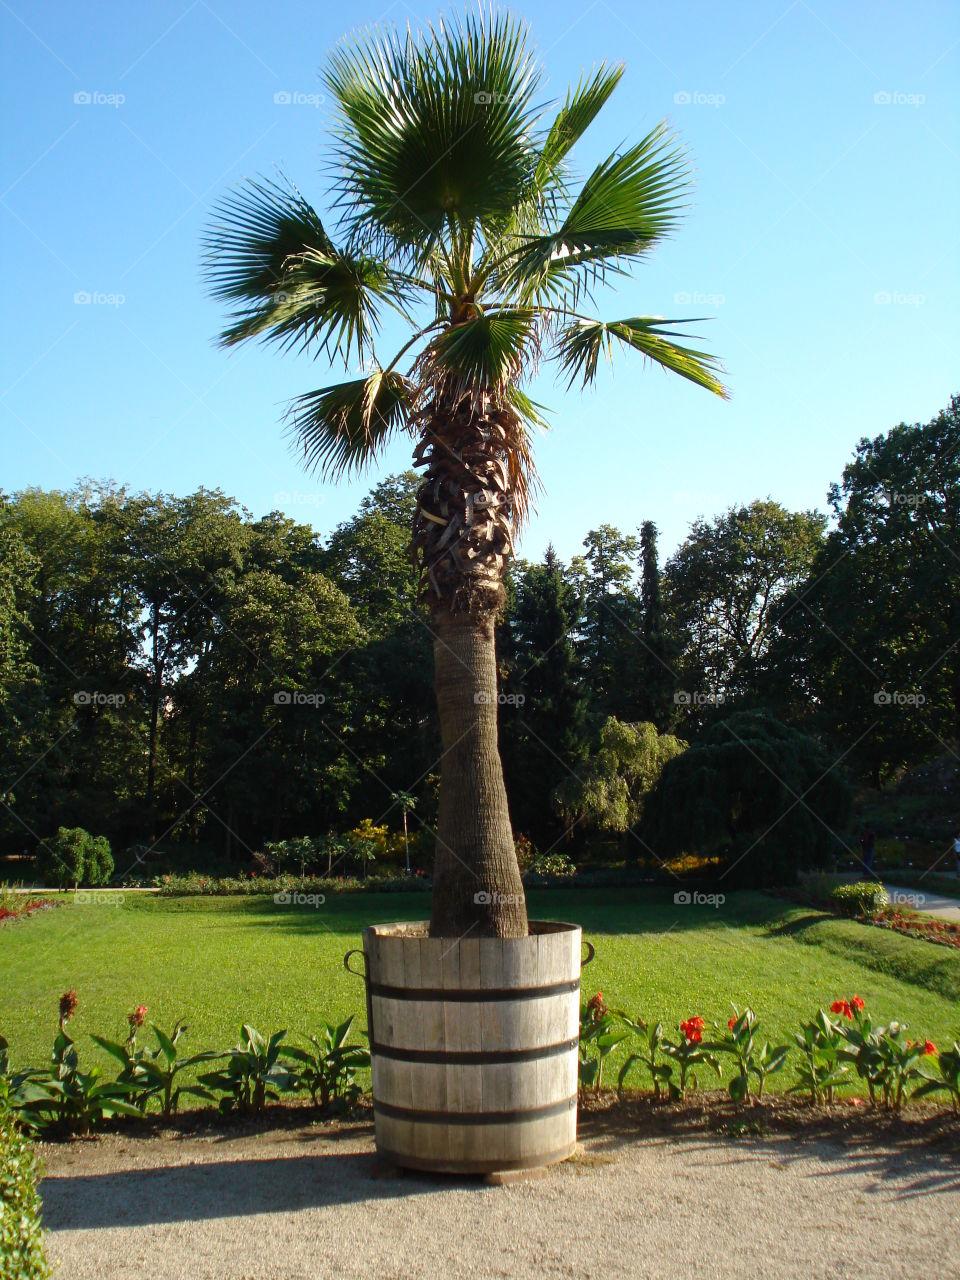 A Palm in a Botanic Garden